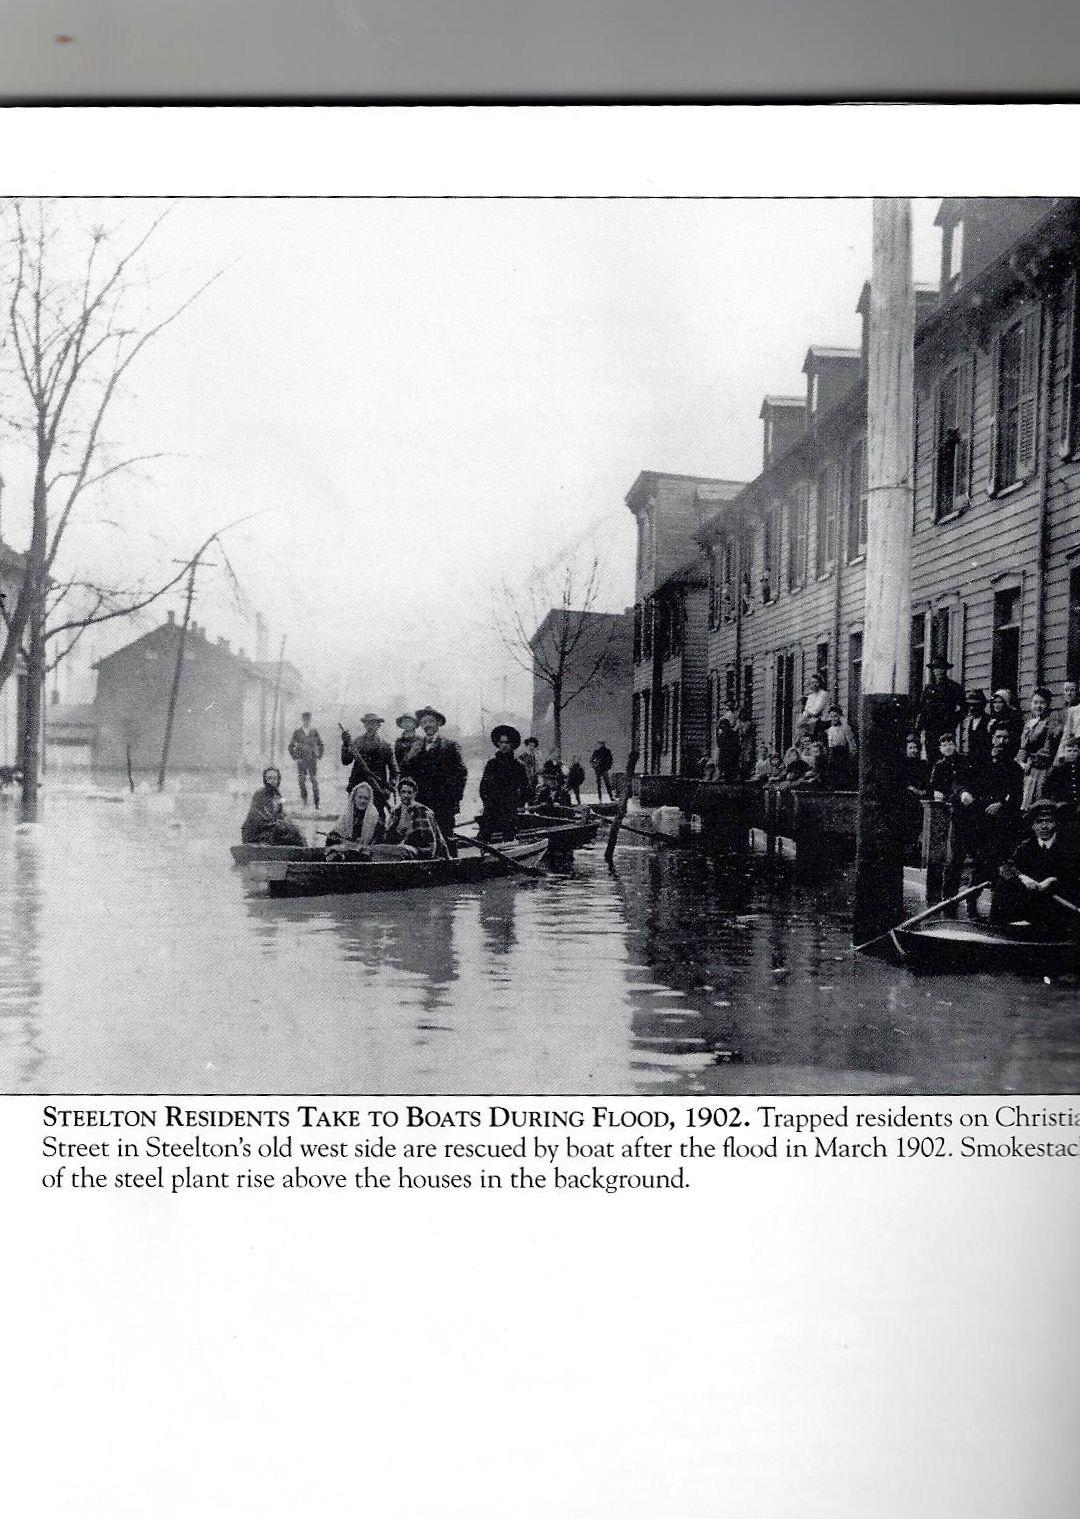 Christian St , Steelton PA Flood 1902 Abraham and Dora Fein